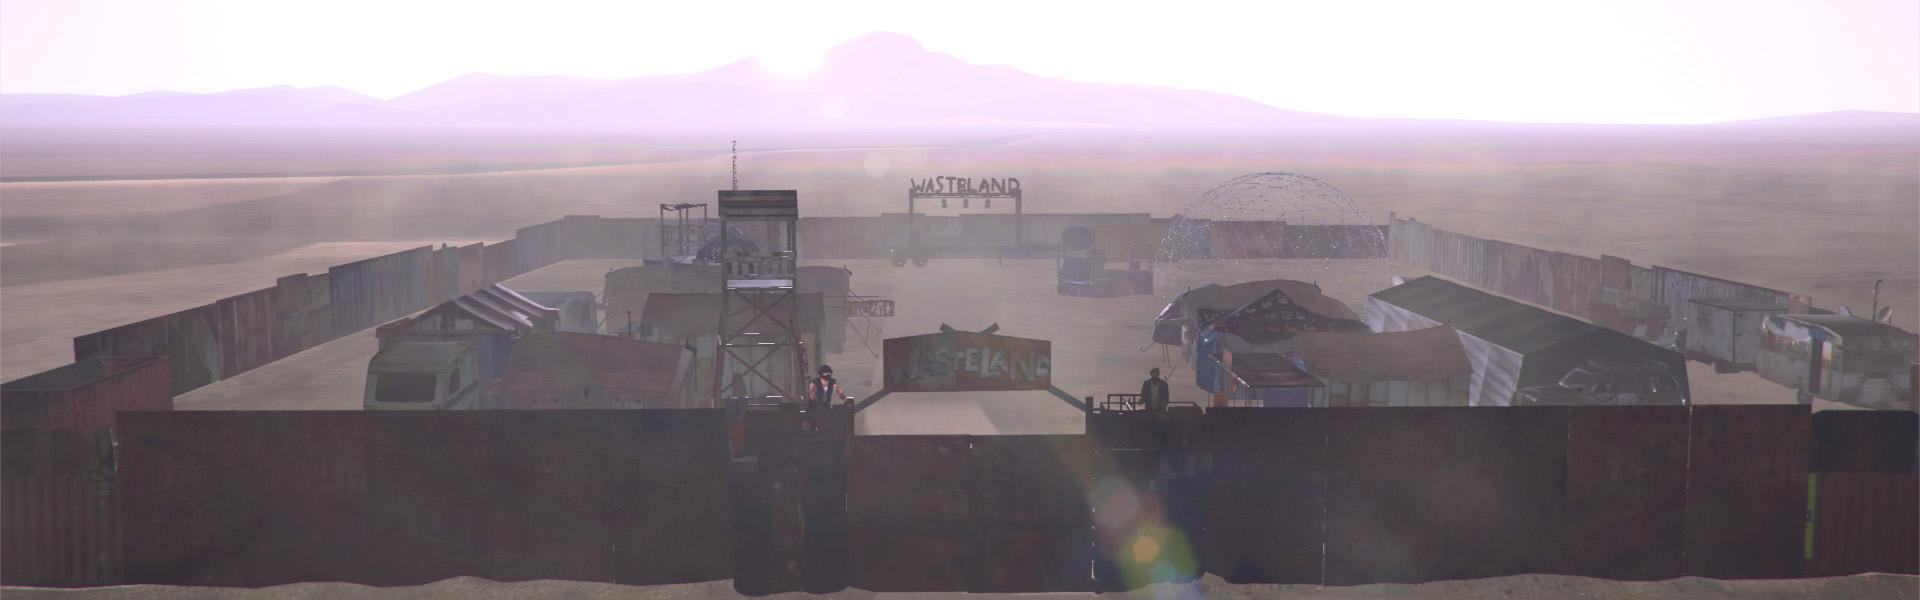 042 WastelandWeekendx600